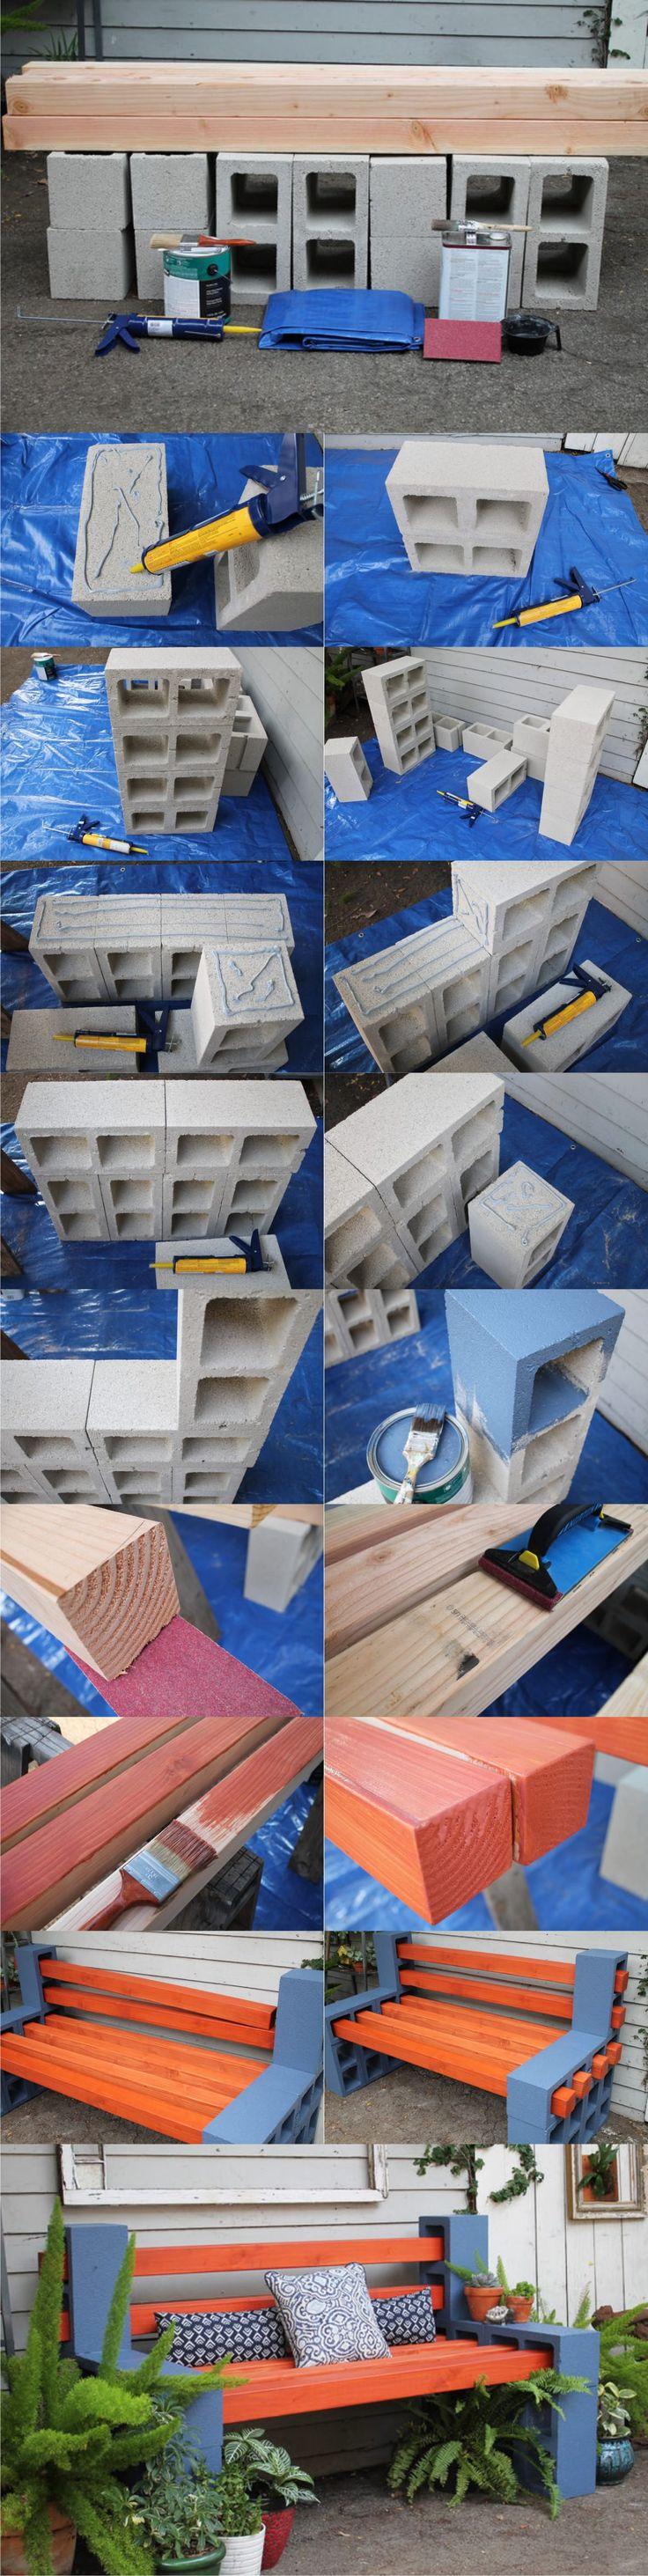 Diy: Outdoor Bench From Concrete Blocks & Wooden Slats Patio & Outdoor Furniture